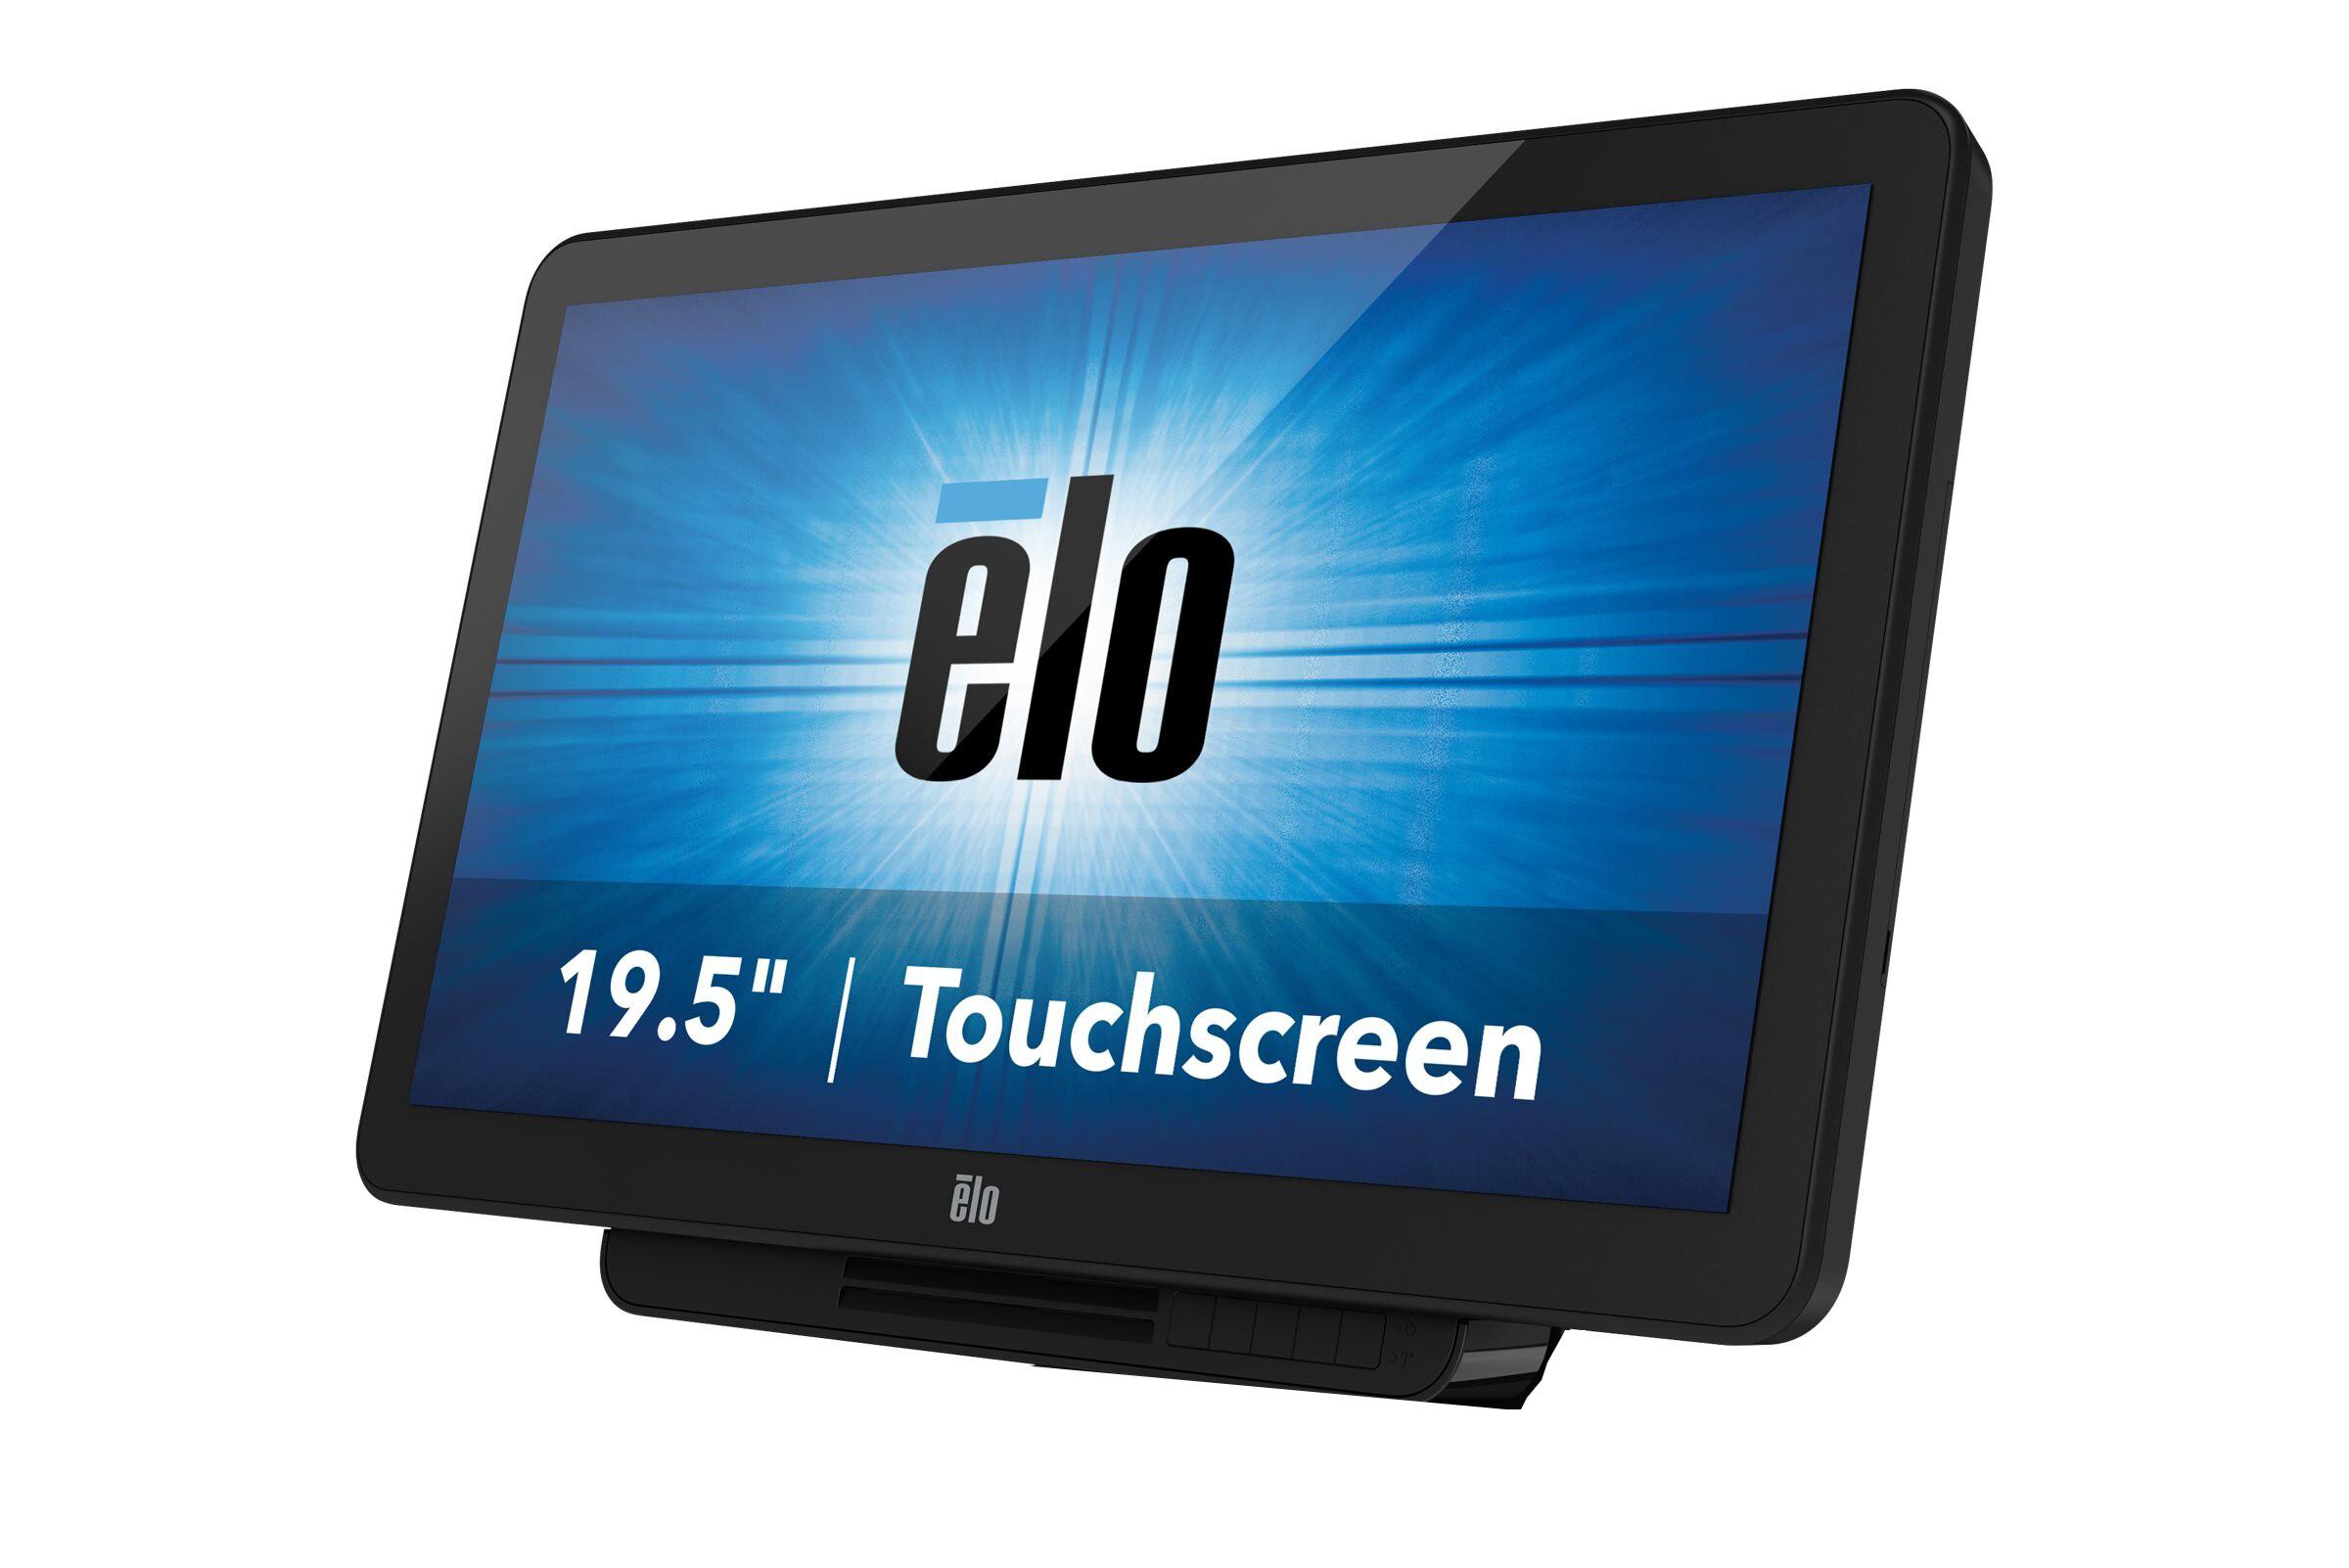 "Sistem POS ELO ESY20x5, Display 19.5"" Touchscreen 1920  by 1080 , Intel Core i5 4590T 2.0 GHz, 8 GB DDR3, 128 GB SSD SATA, WI-FI,Bluetooth, Lipsa Picior, Windows 10 Pro, 2 Ani Garantie - imaginea 2"